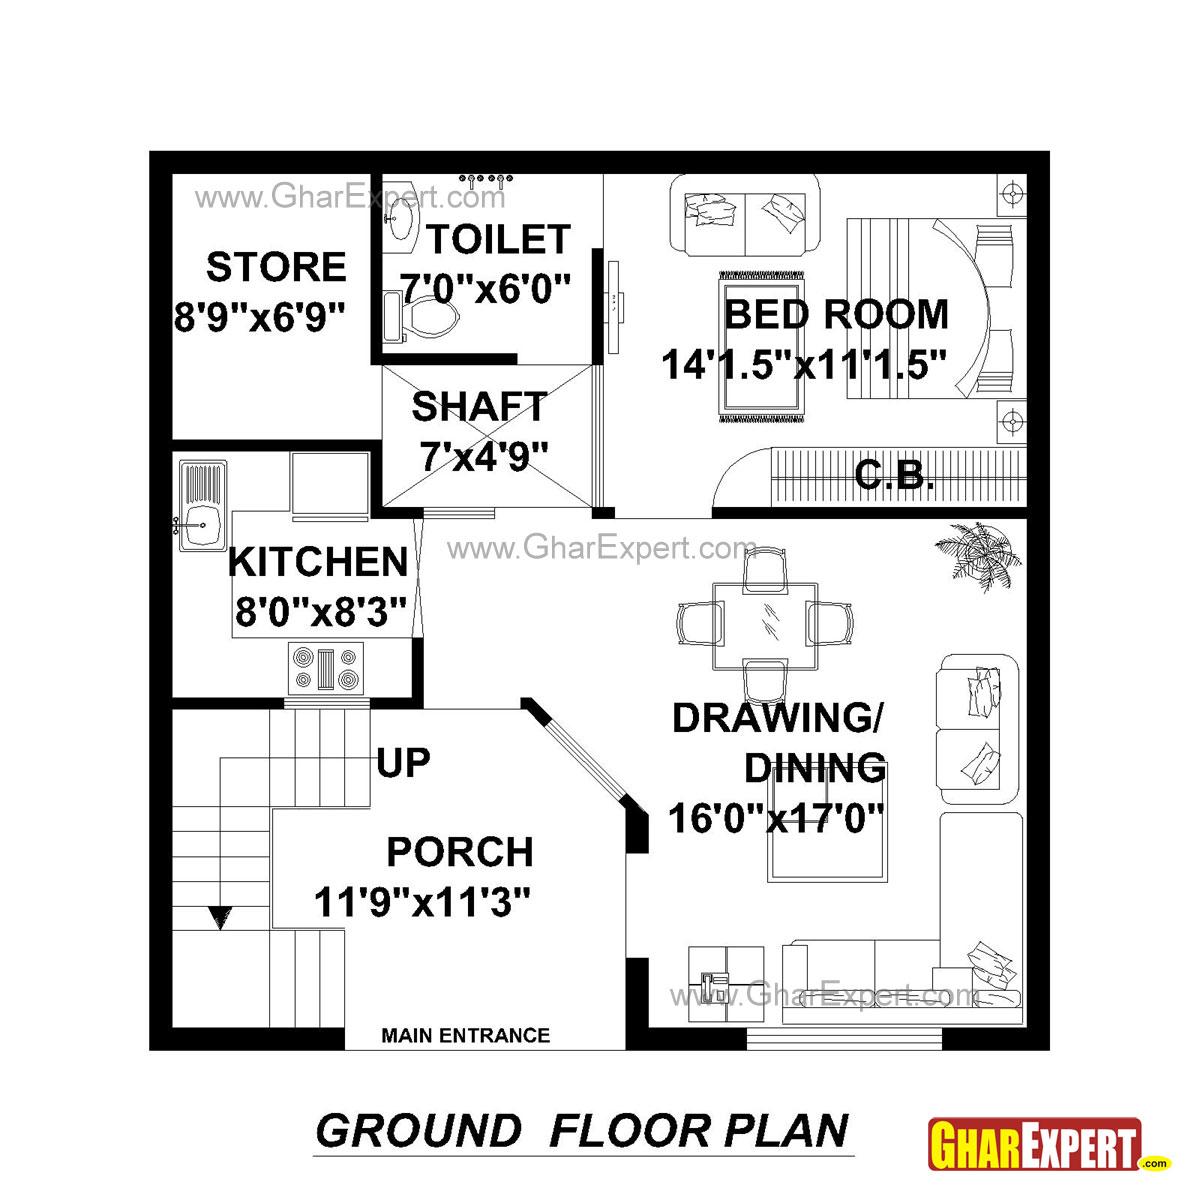 House Plan for 30 Feet by 30 Feet plot (Plot Size 100